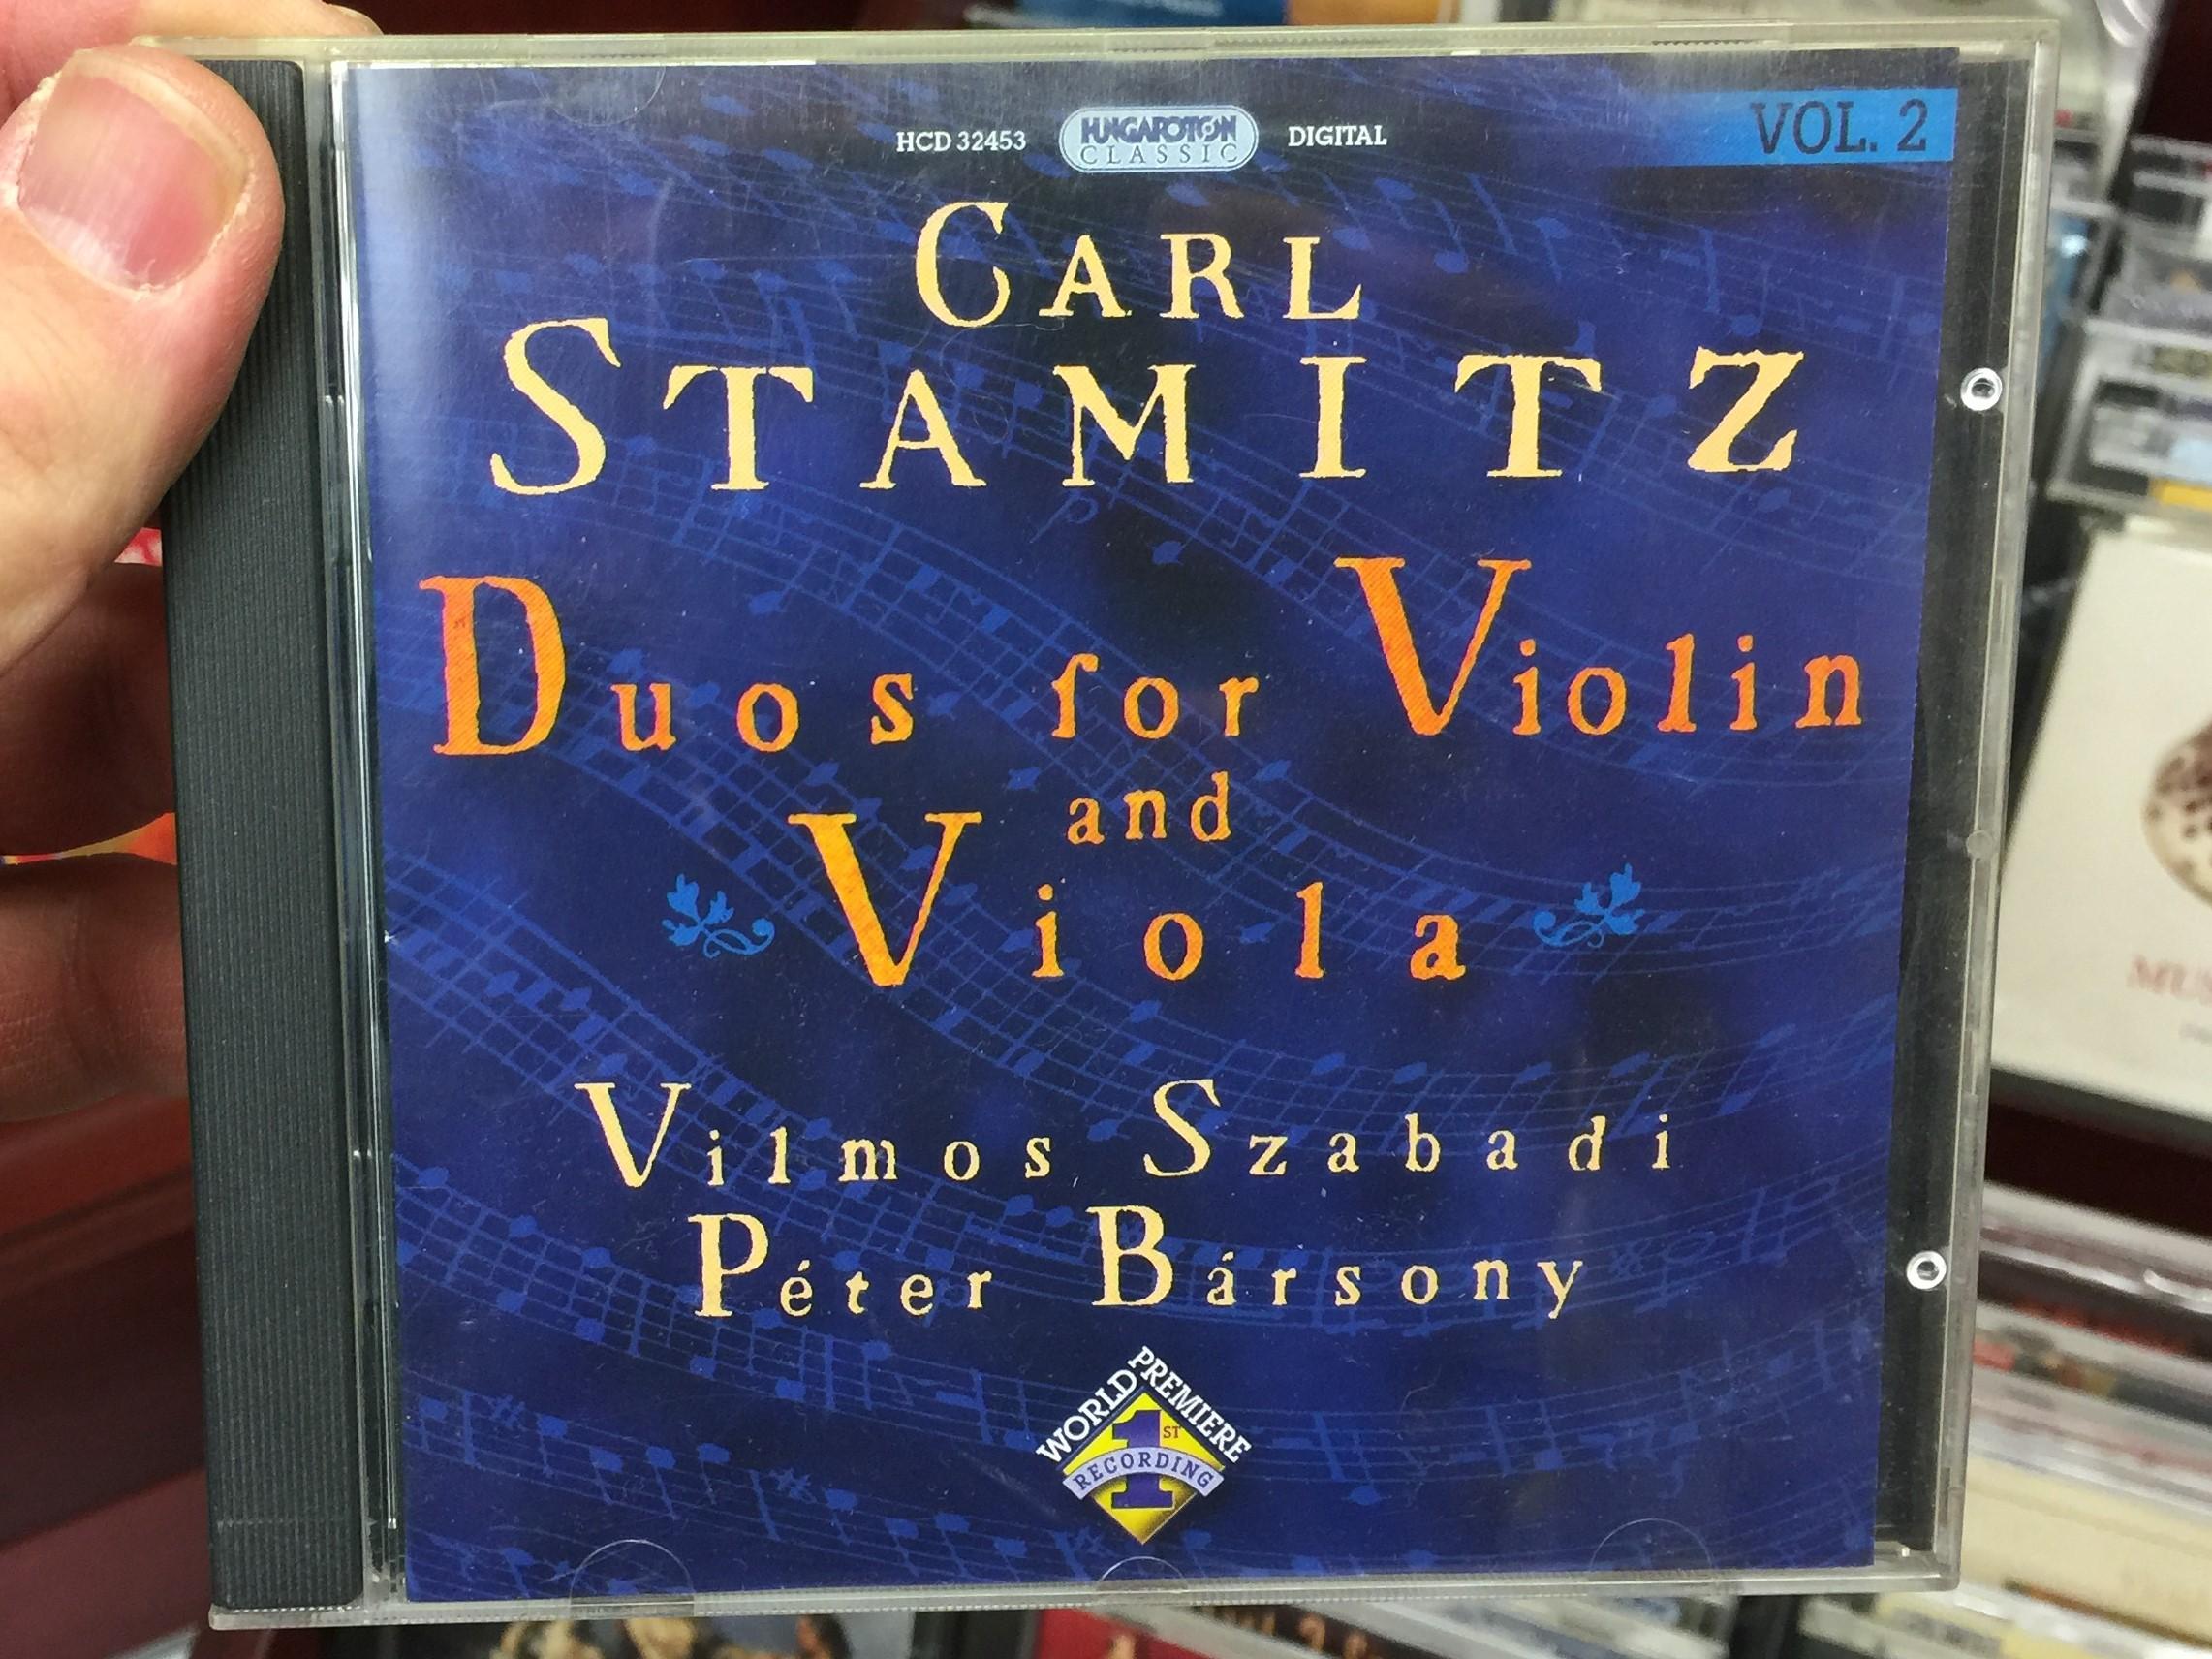 carl-stamitz-duos-for-violin-and-viola-vilmos-szabadi-peter-barsony-hungaroton-classic-audio-cd-2007-stereo-hcd-32453-1-.jpg